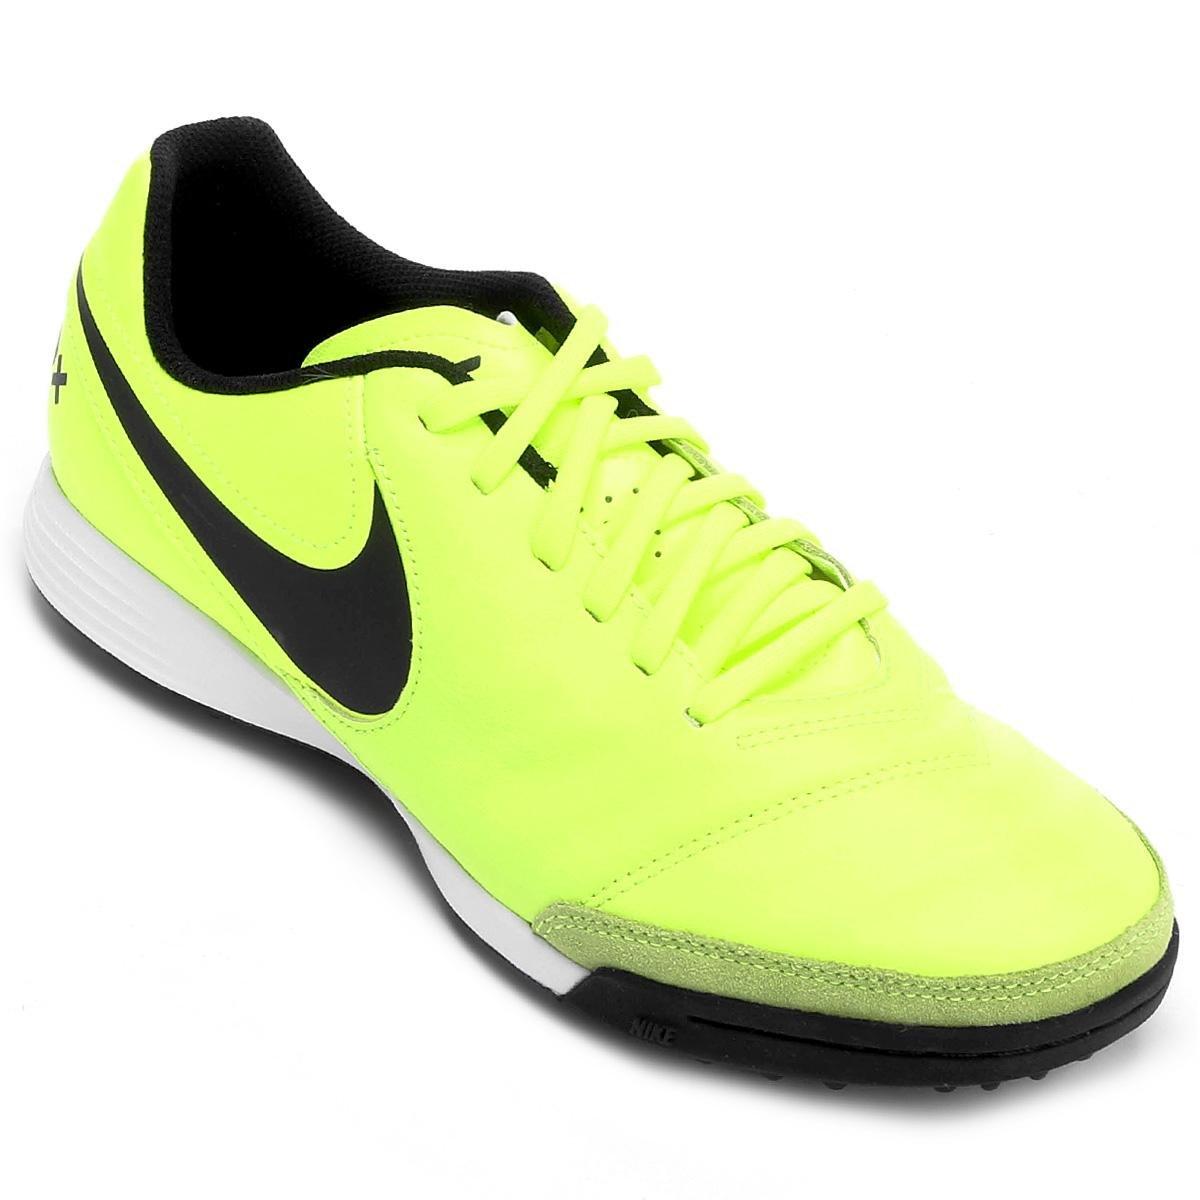 6c0be00b4a Chuteira Society Nike Tiempo Genio 2 Leather TF - Compre Agora ...